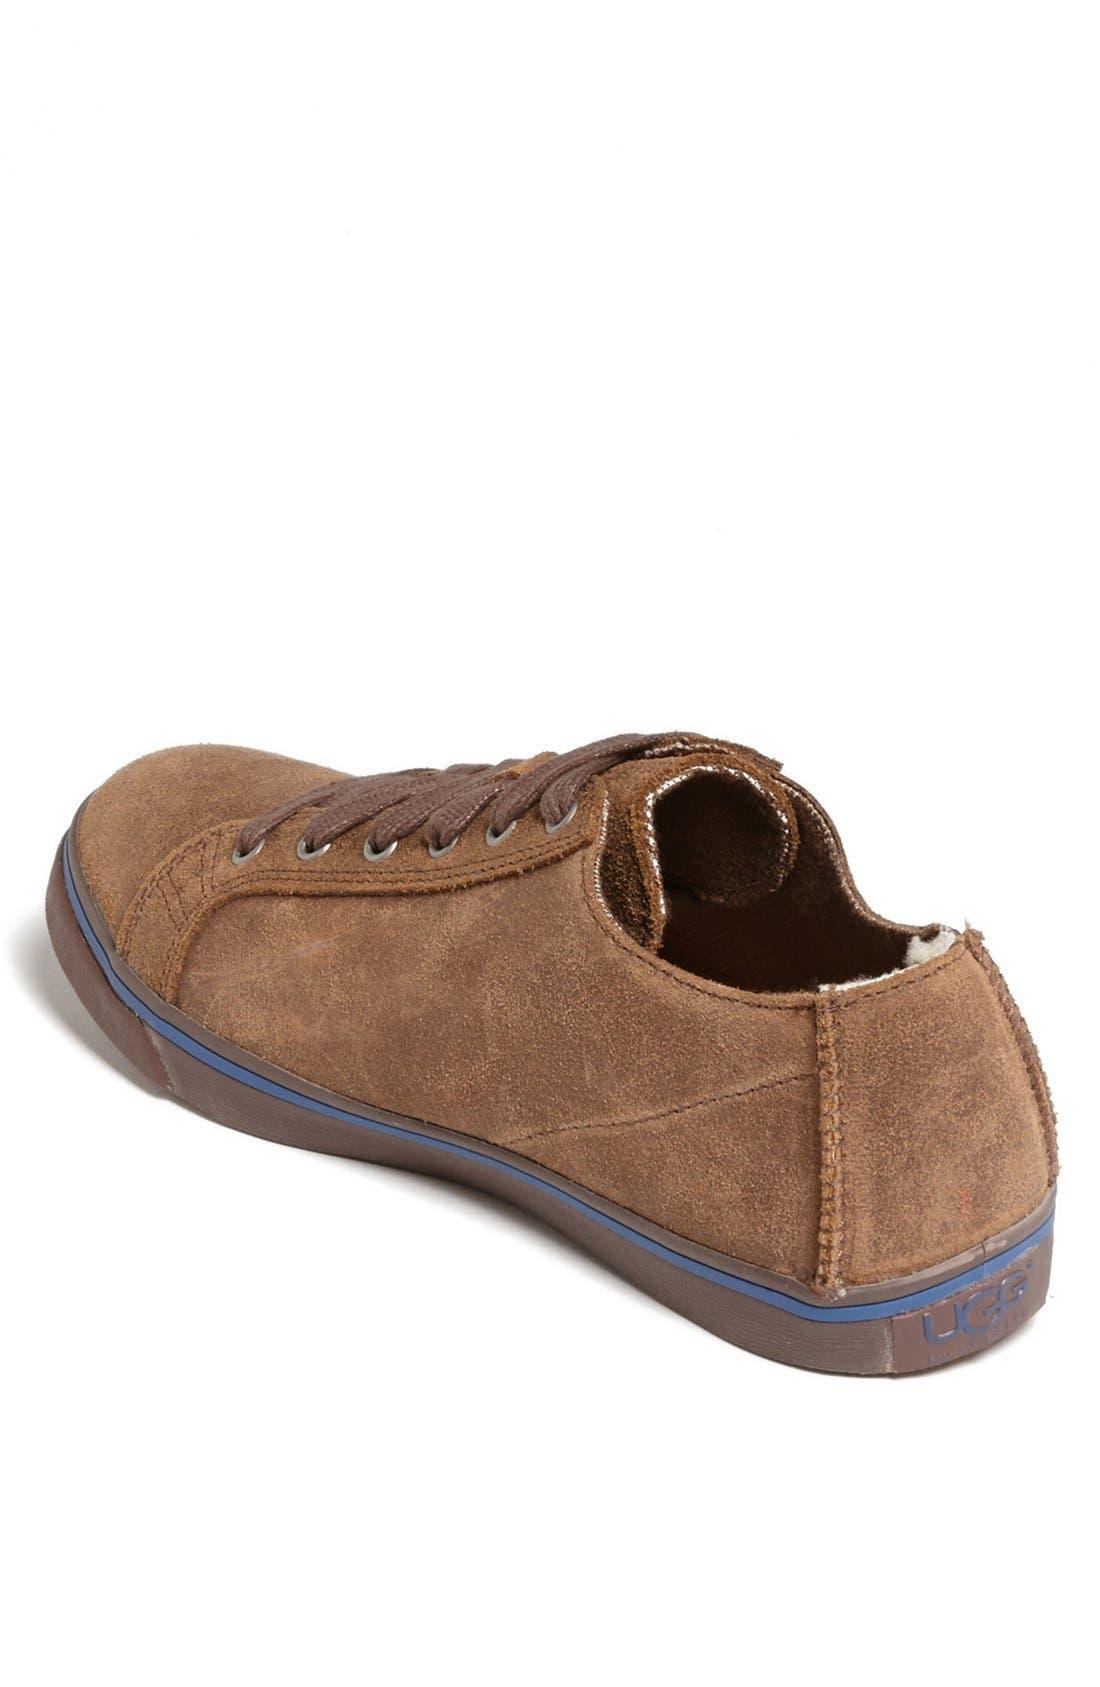 Australia 'Vanowen' Sneaker,                             Alternate thumbnail 4, color,